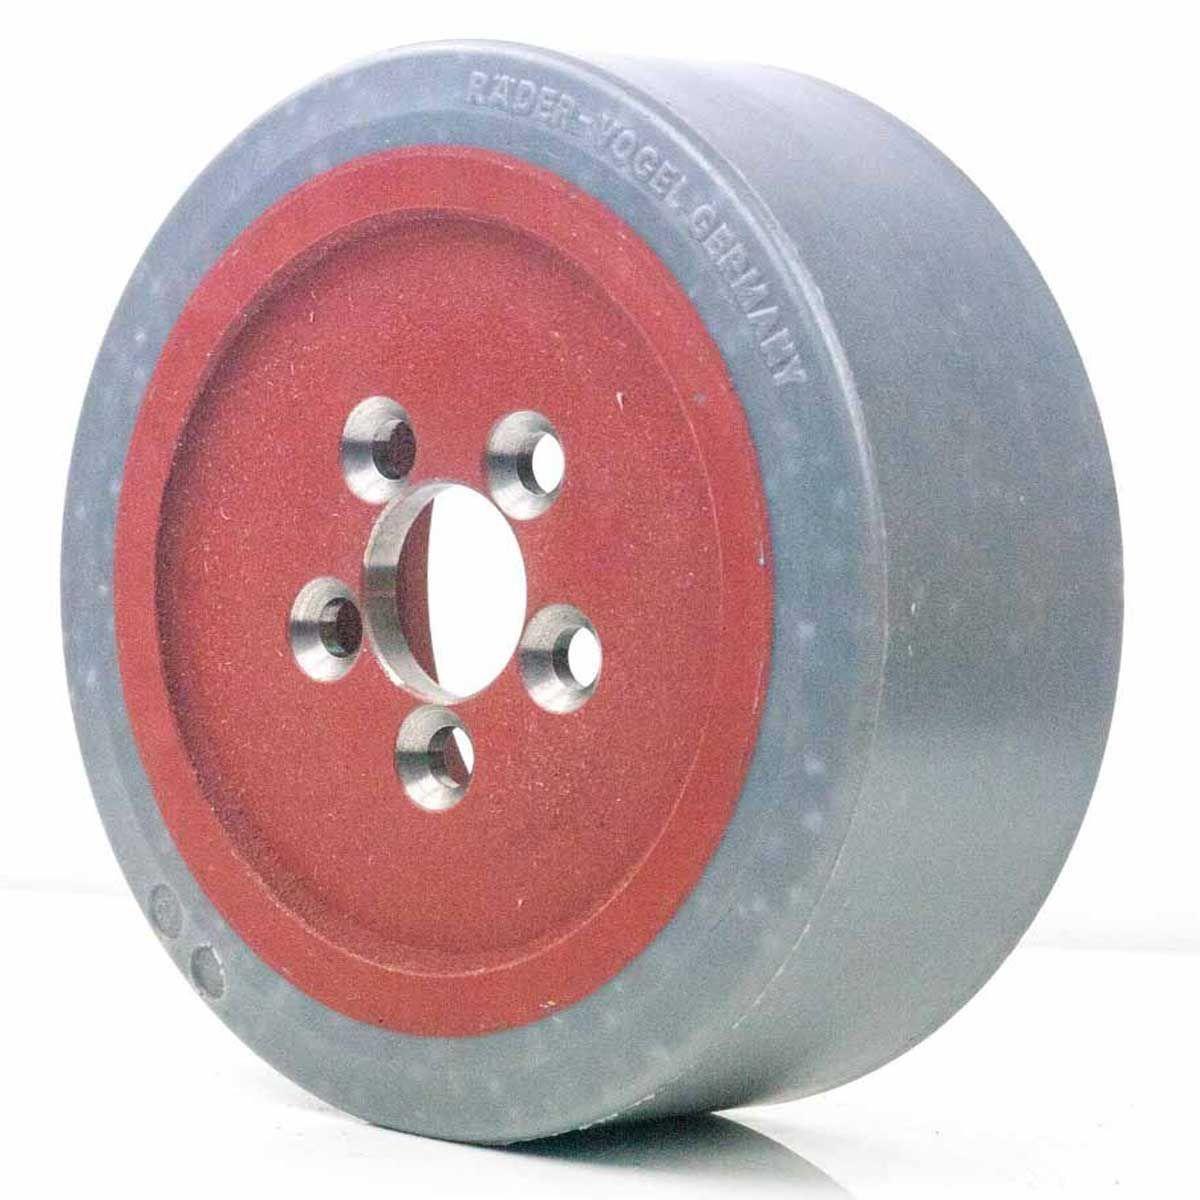 Polyurethane Wet Grip Drive Wheel